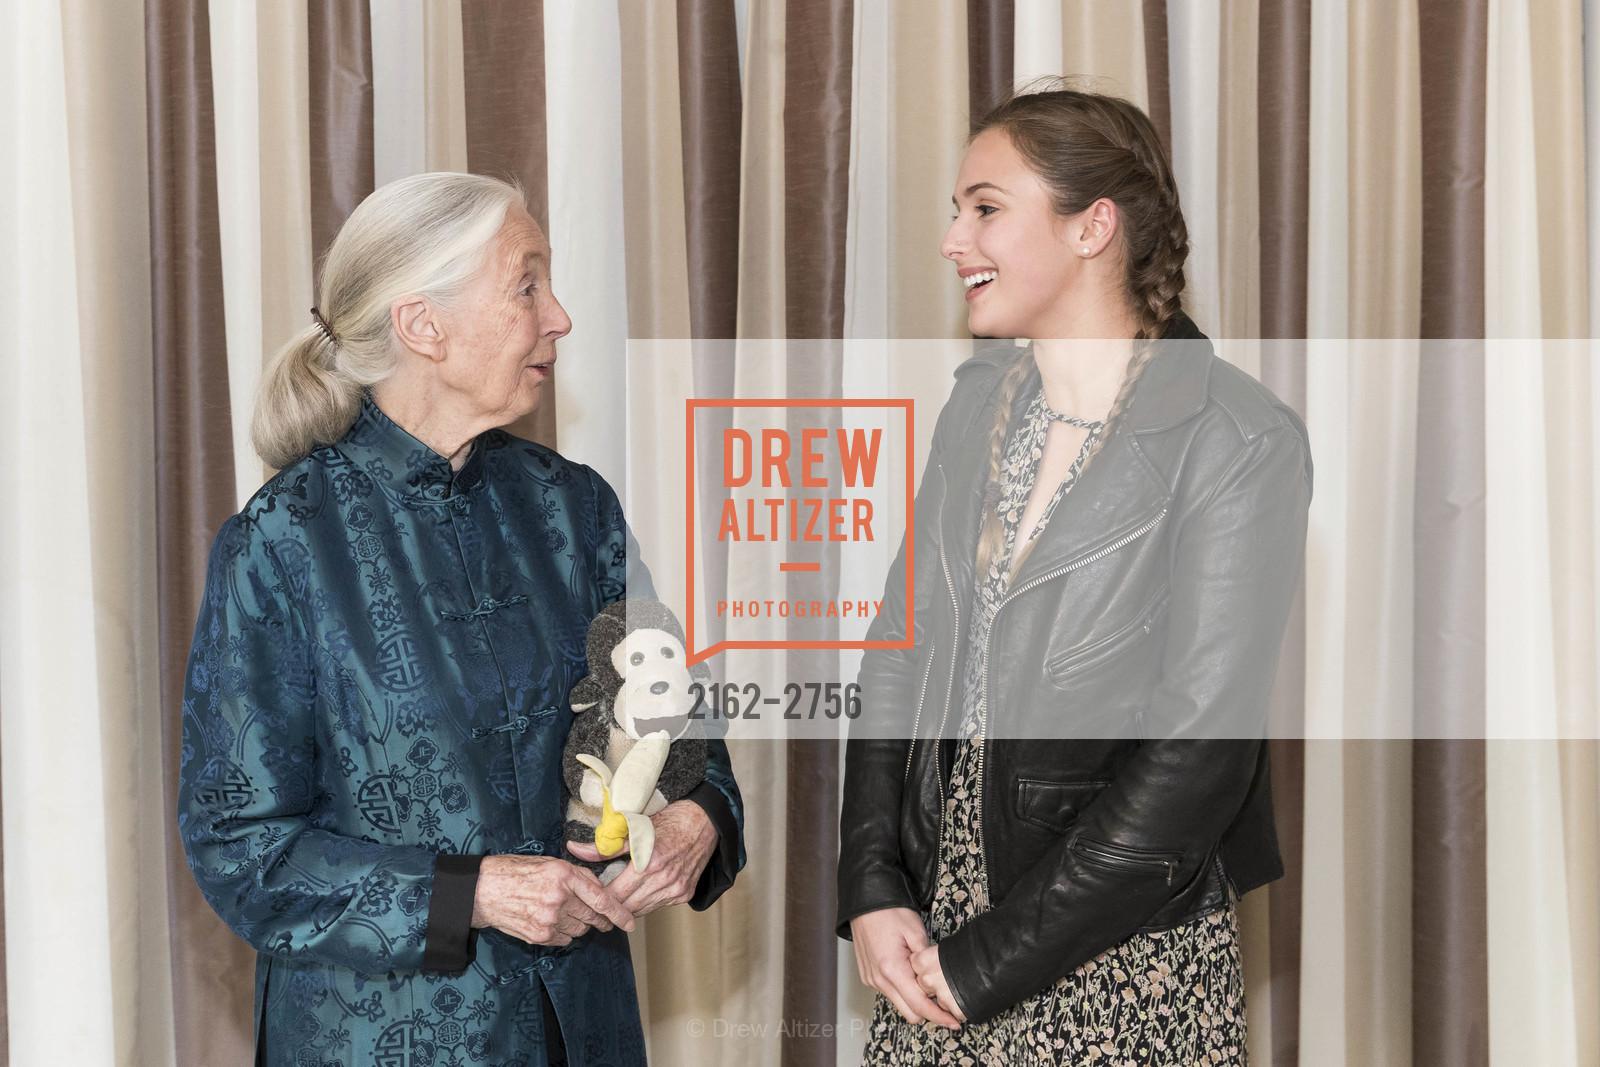 Jane Goodall, Lianna Nixon, Photo #2162-2756